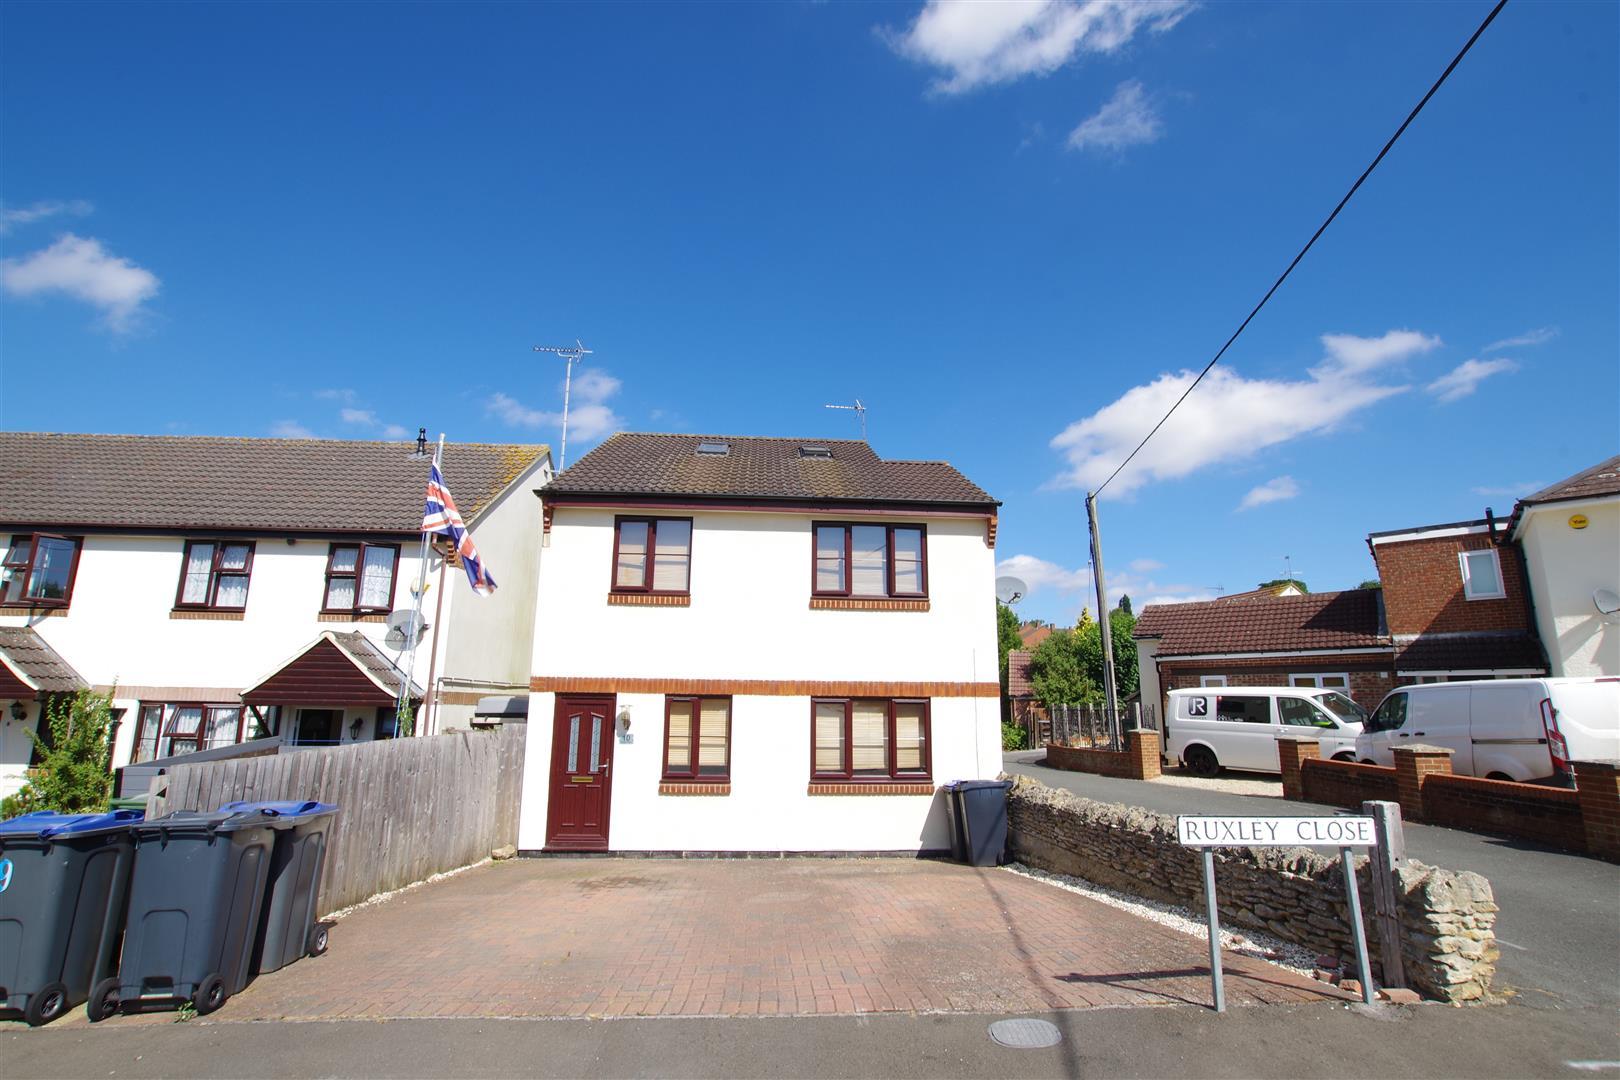 Ruxley Close, Royal Wootton Bassett